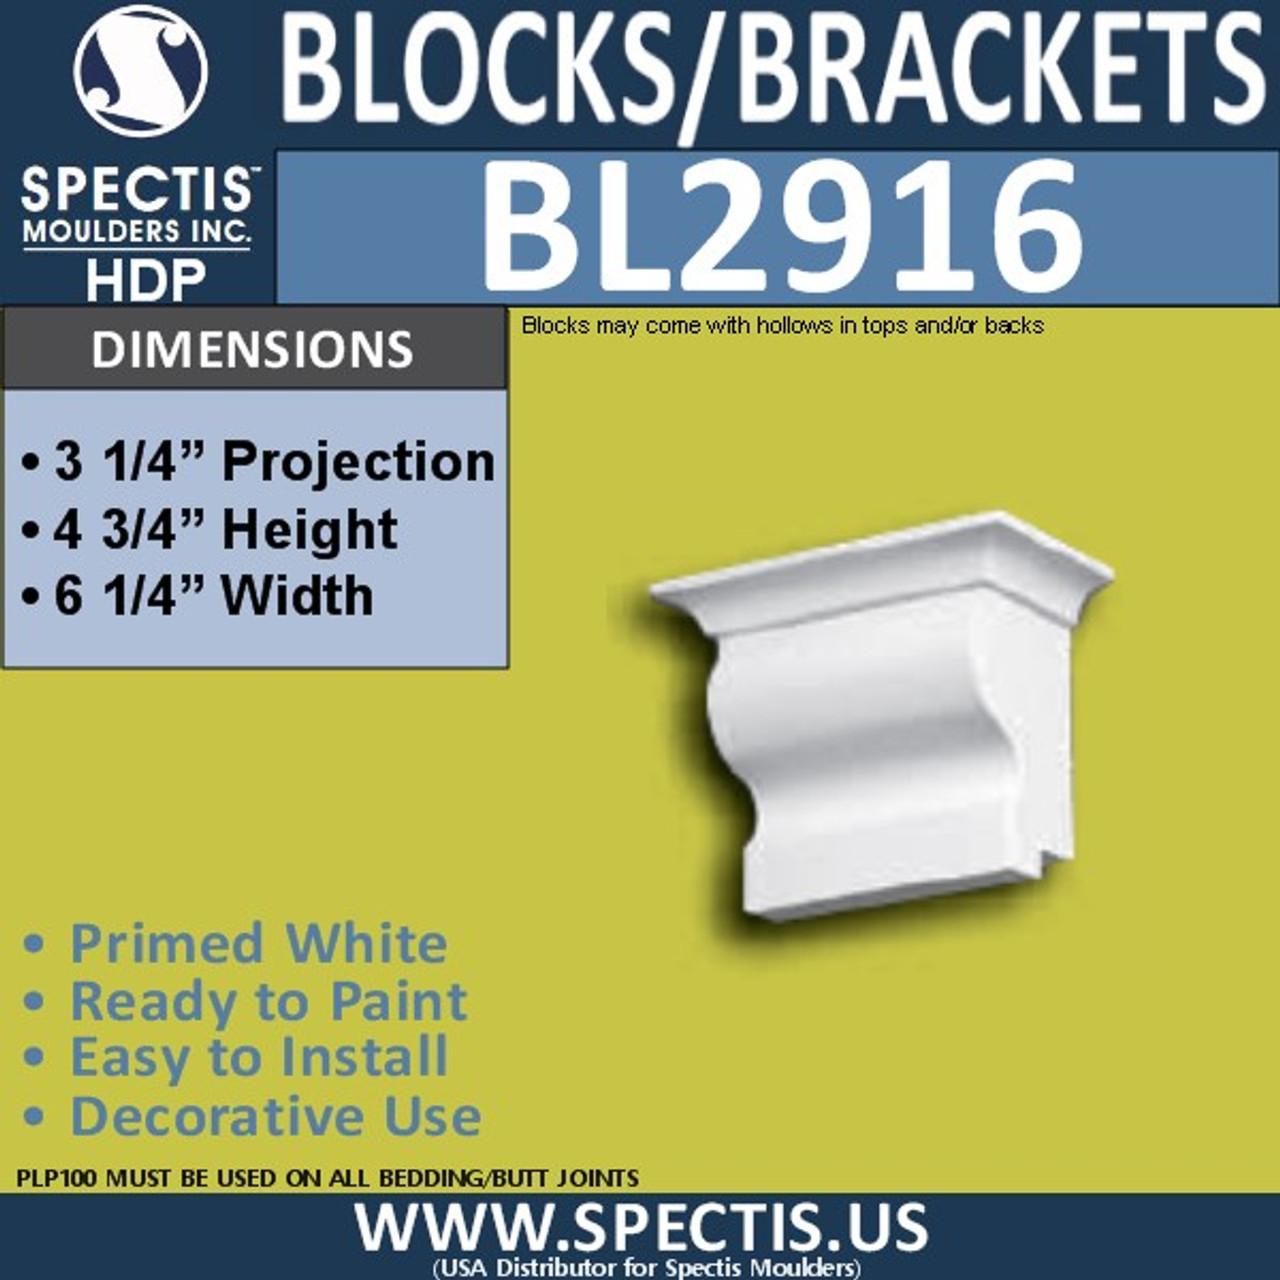 "BL2916 Eave Block or Bracket 6.25""W x 4.75""H x 3.25"" P"